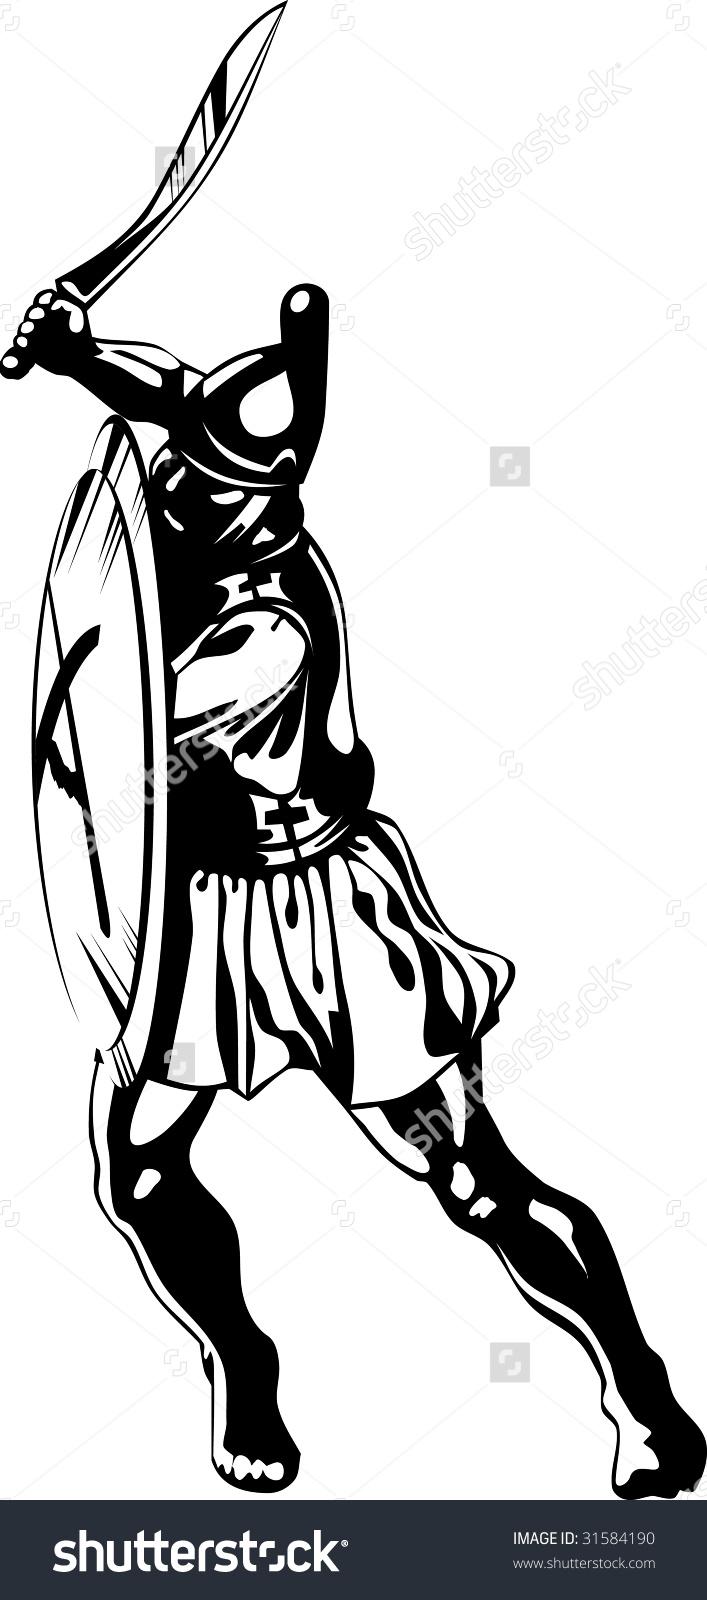 Greek hero clipart banner transparent Vector Art Of Ancient Greek Hero Black And White - 31584190 ... banner transparent